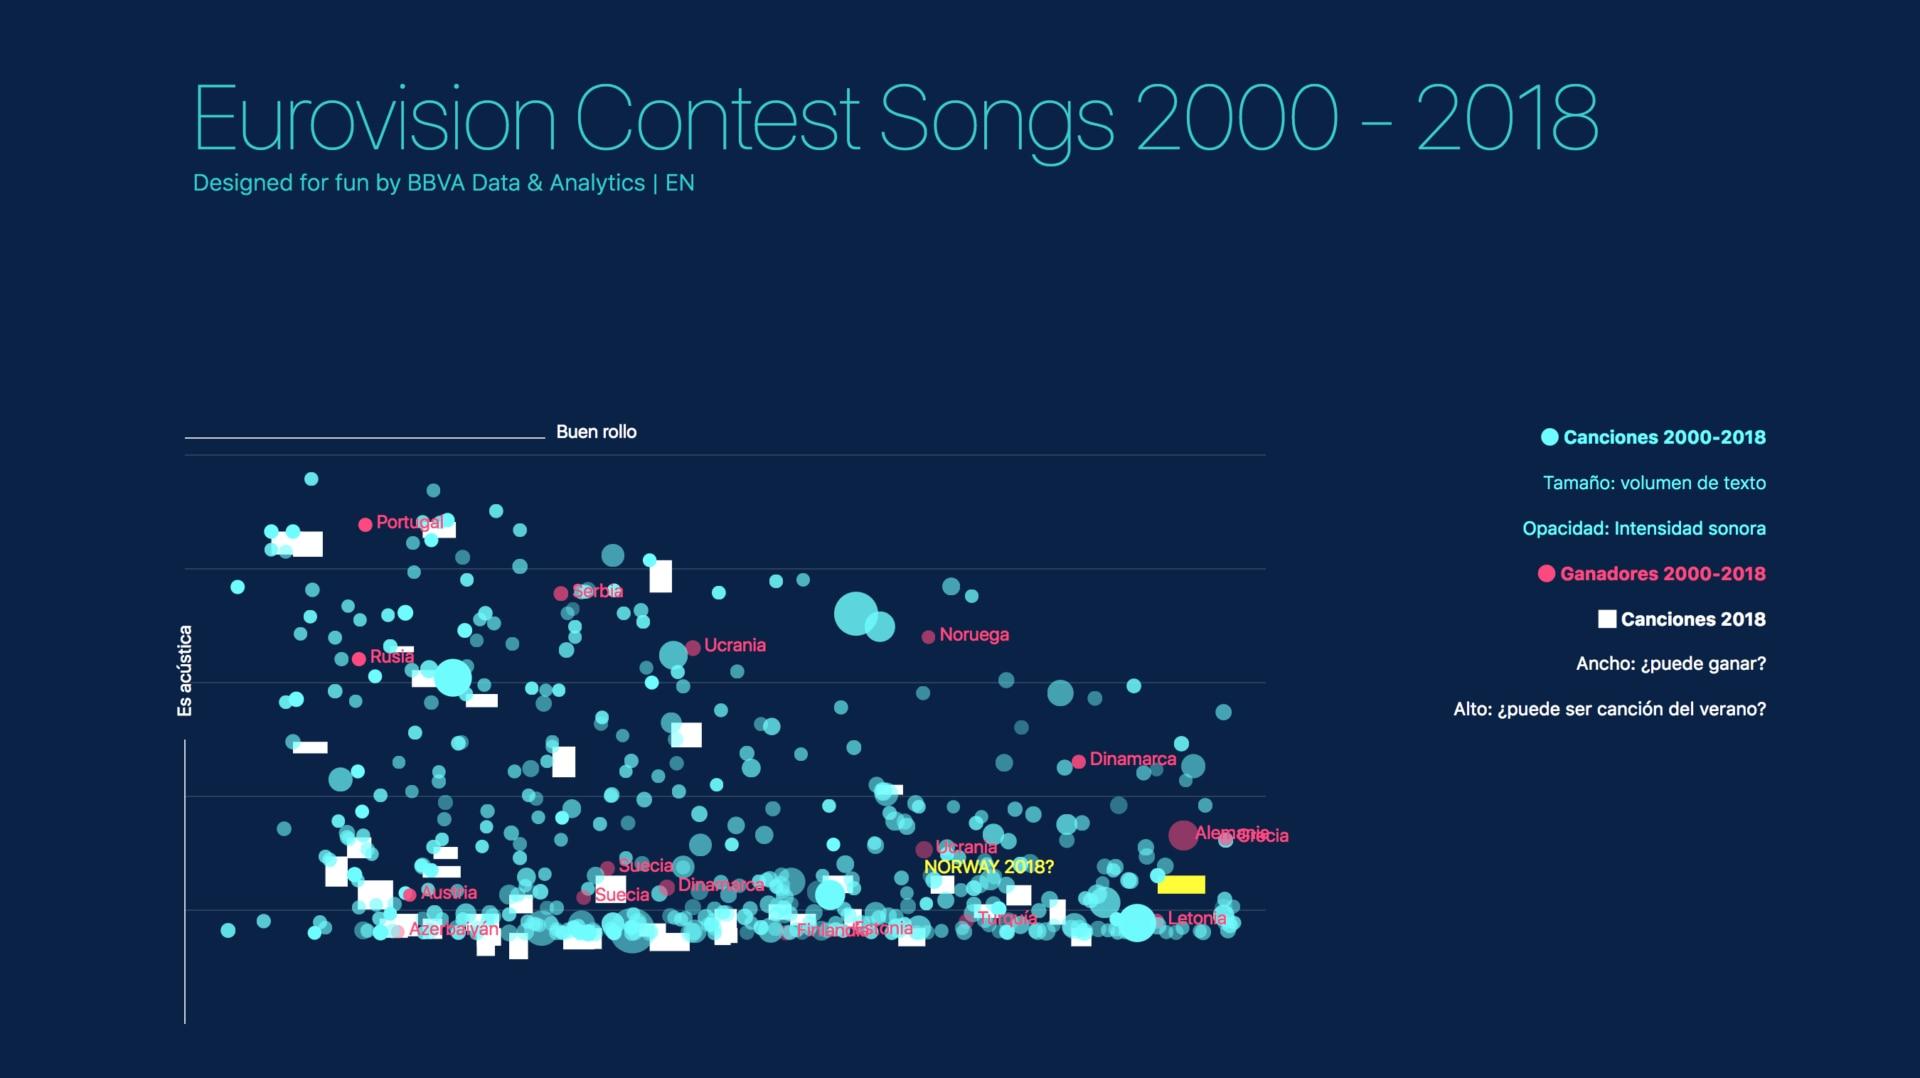 portada-eurovision-datos-bbva